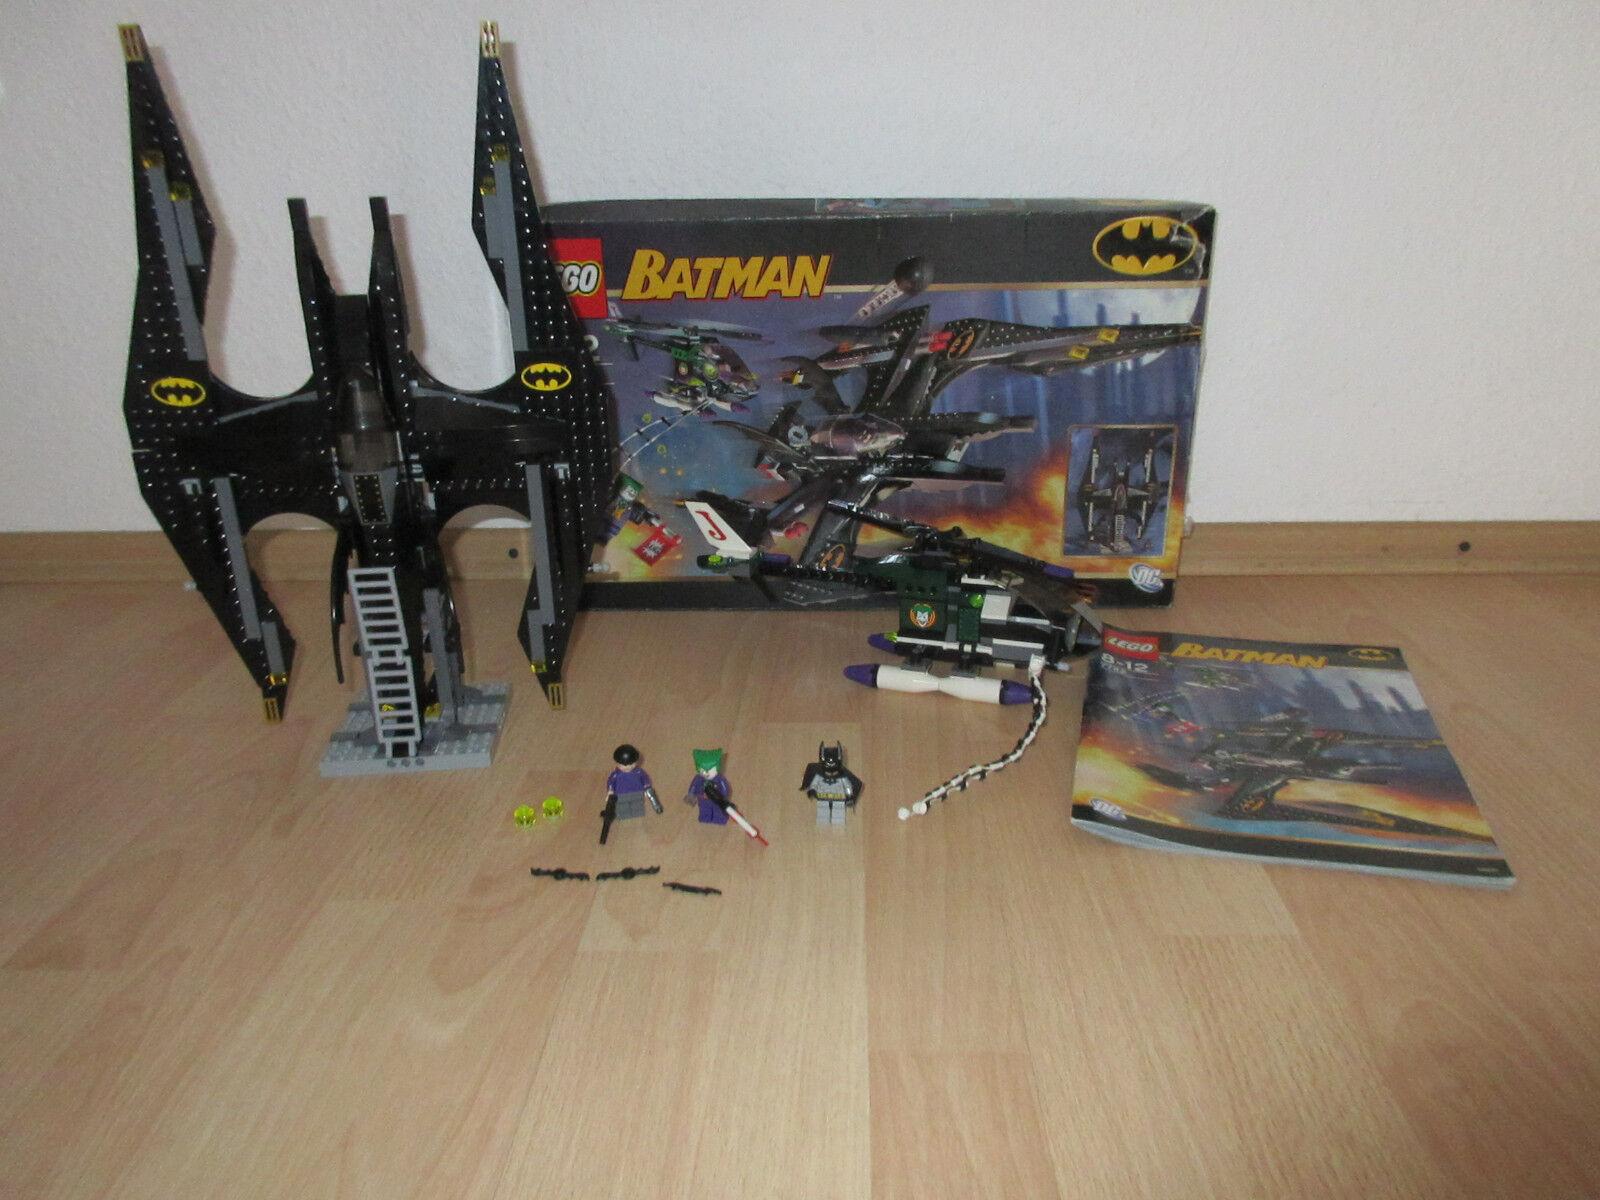 LEGO Batman 7782 The Joker's Aerial Assault mit Figuren, Bauplan & Karton    Qualitätskönigin